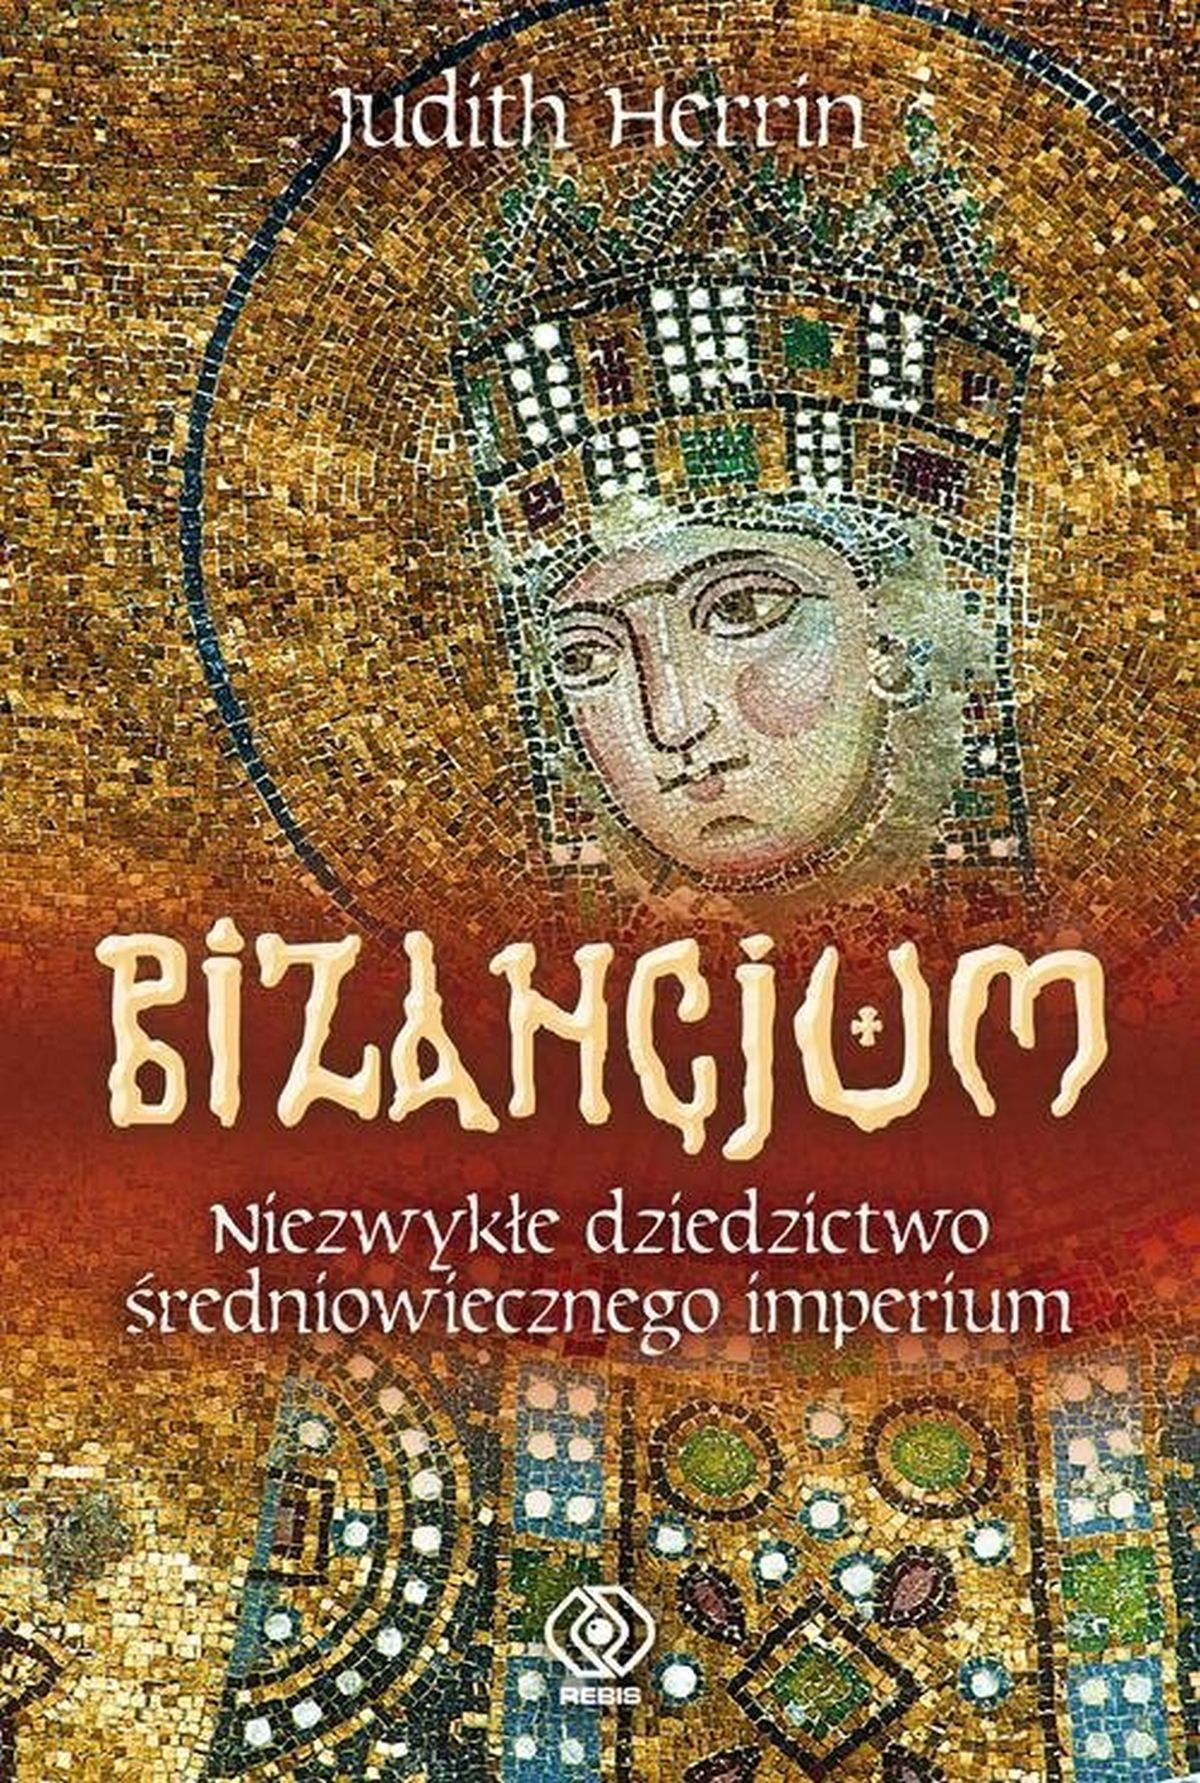 Bizancjum, autorstwa Judith Herrin